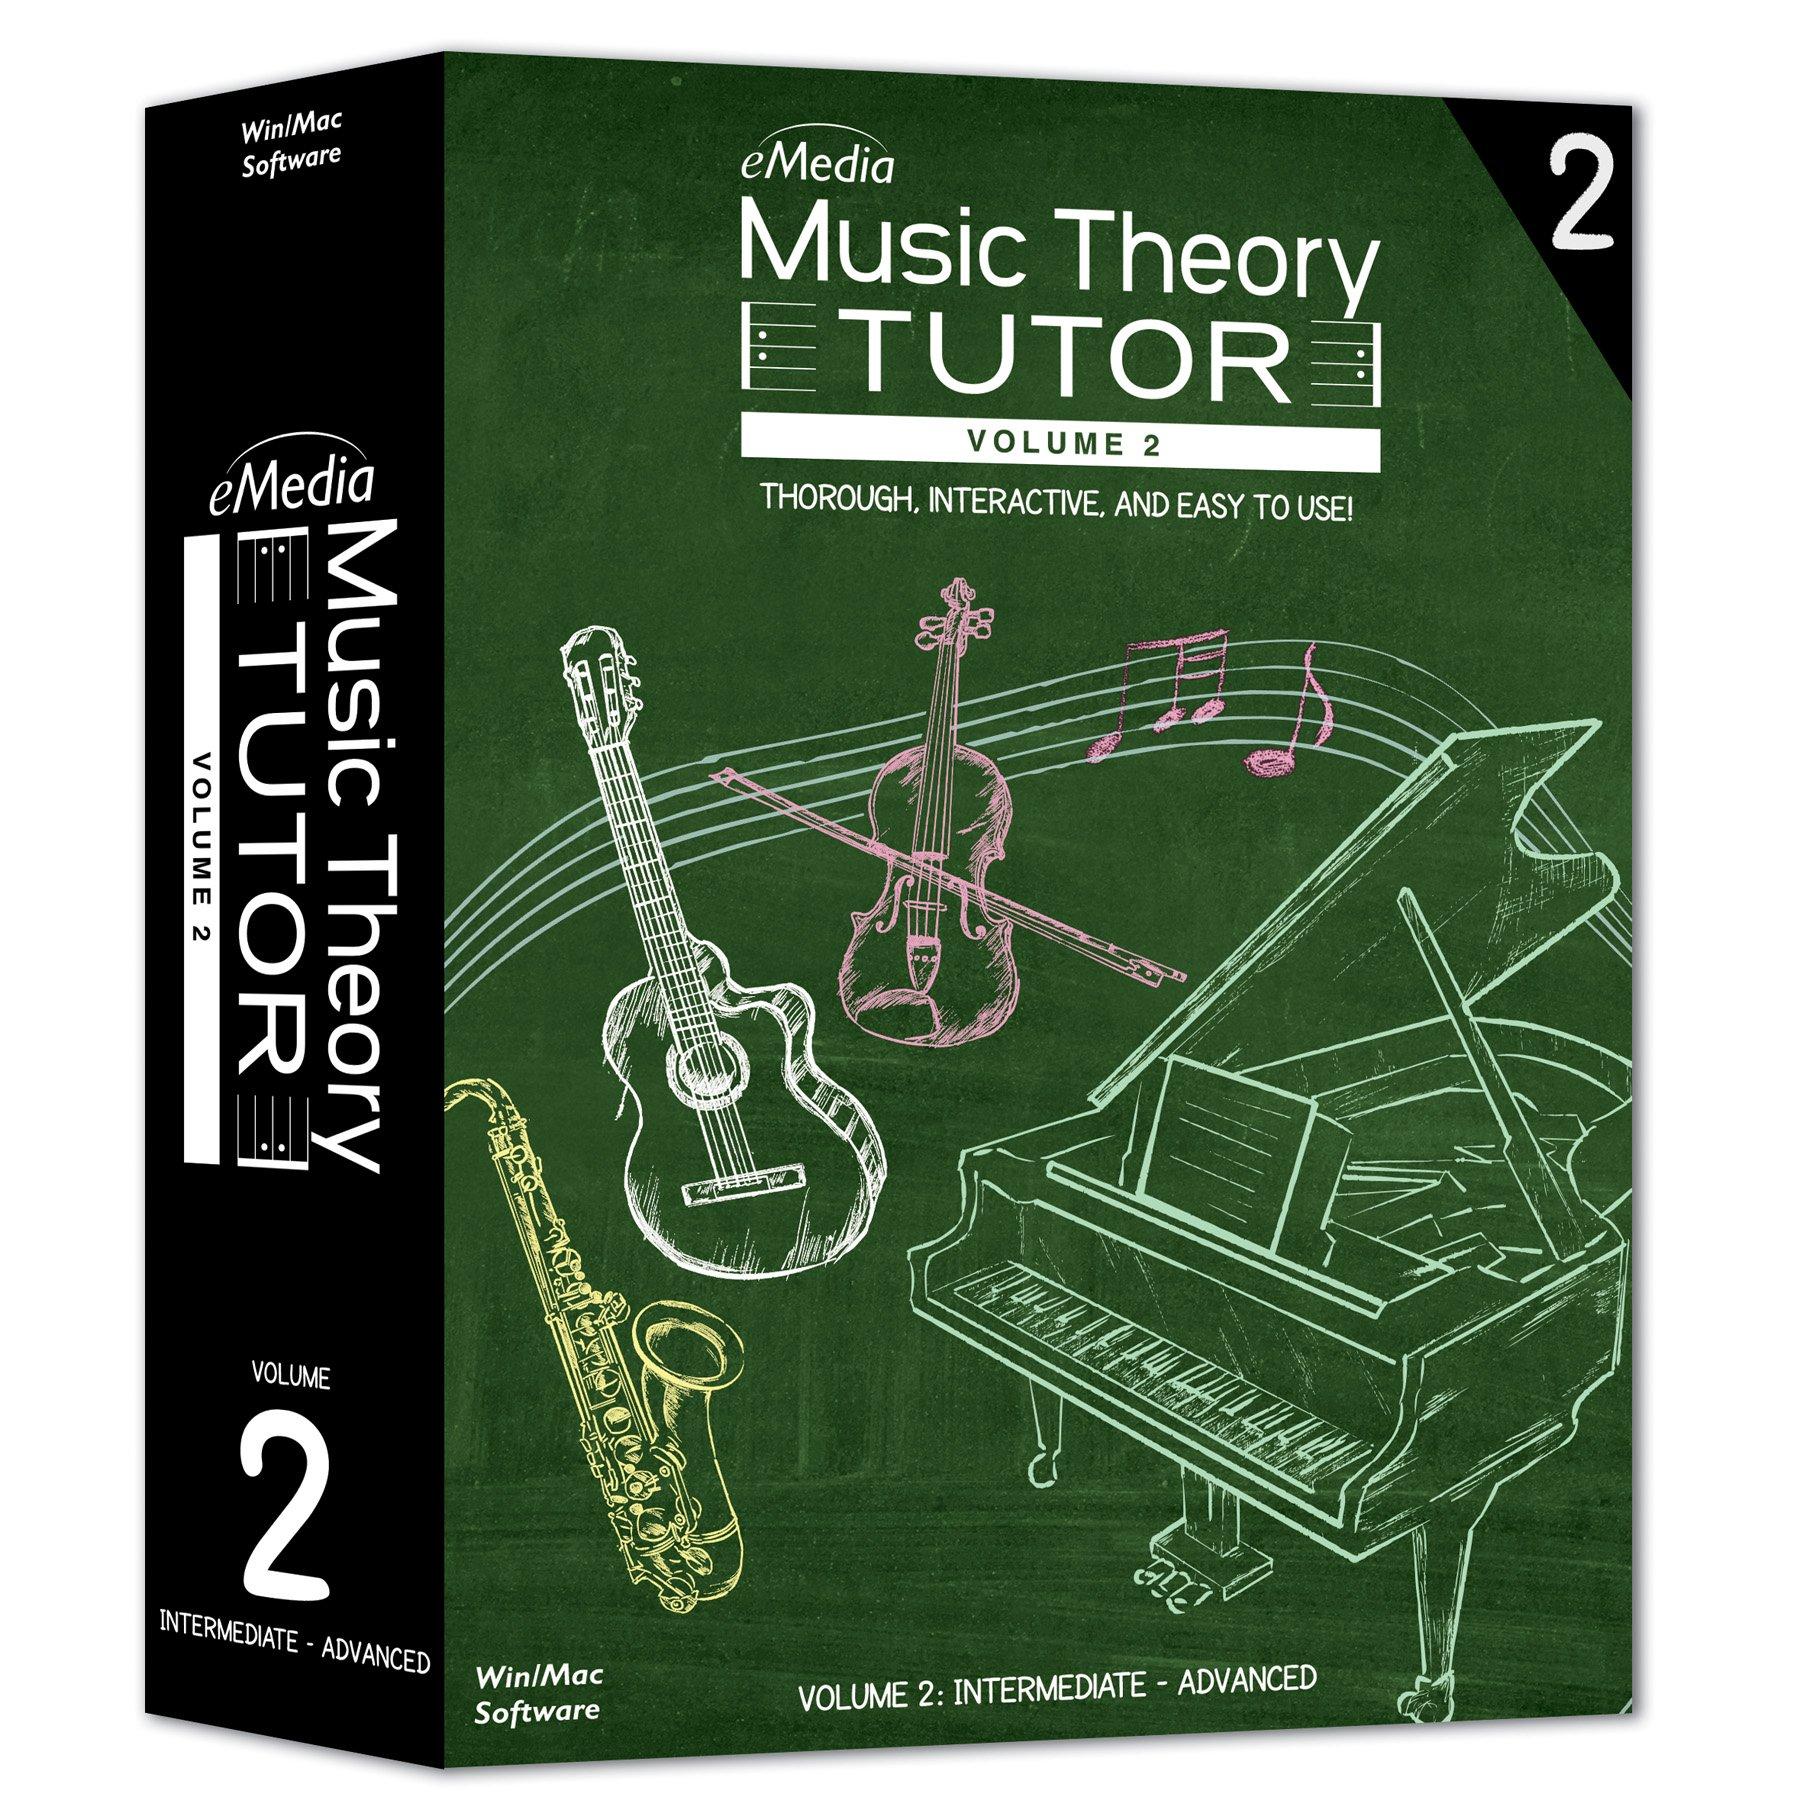 eMedia Music Theory Tutor, Volume 2